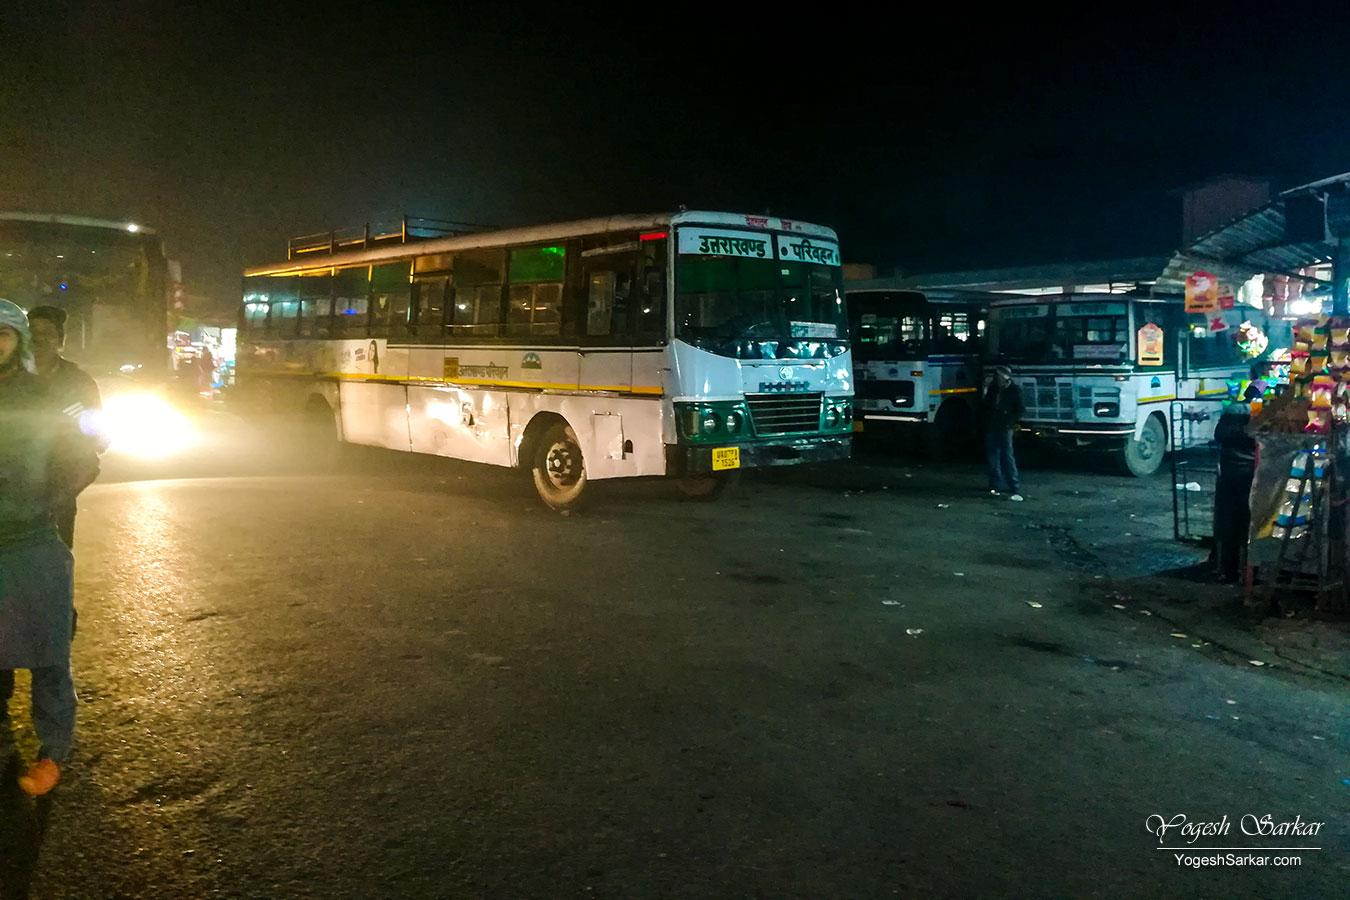 10-haldwani-bus-depot.jpg